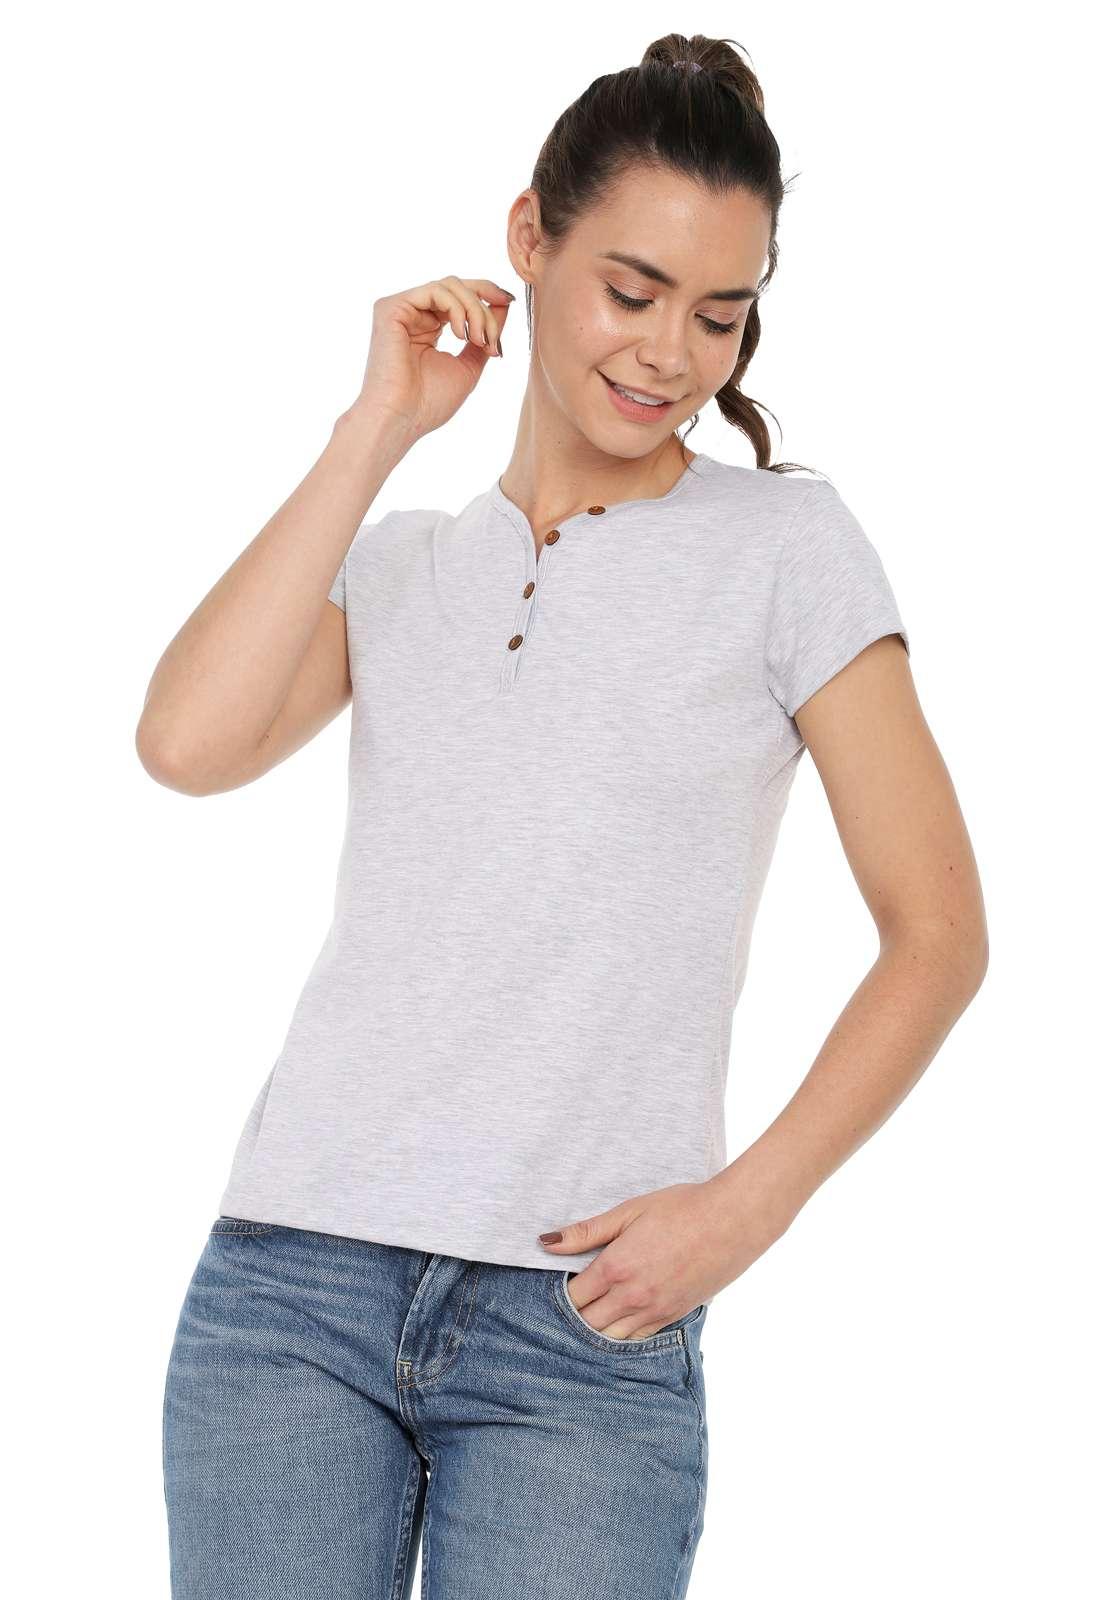 Camiseta Mujer Con Botones Licrada - Gris Jaspe | Polovers